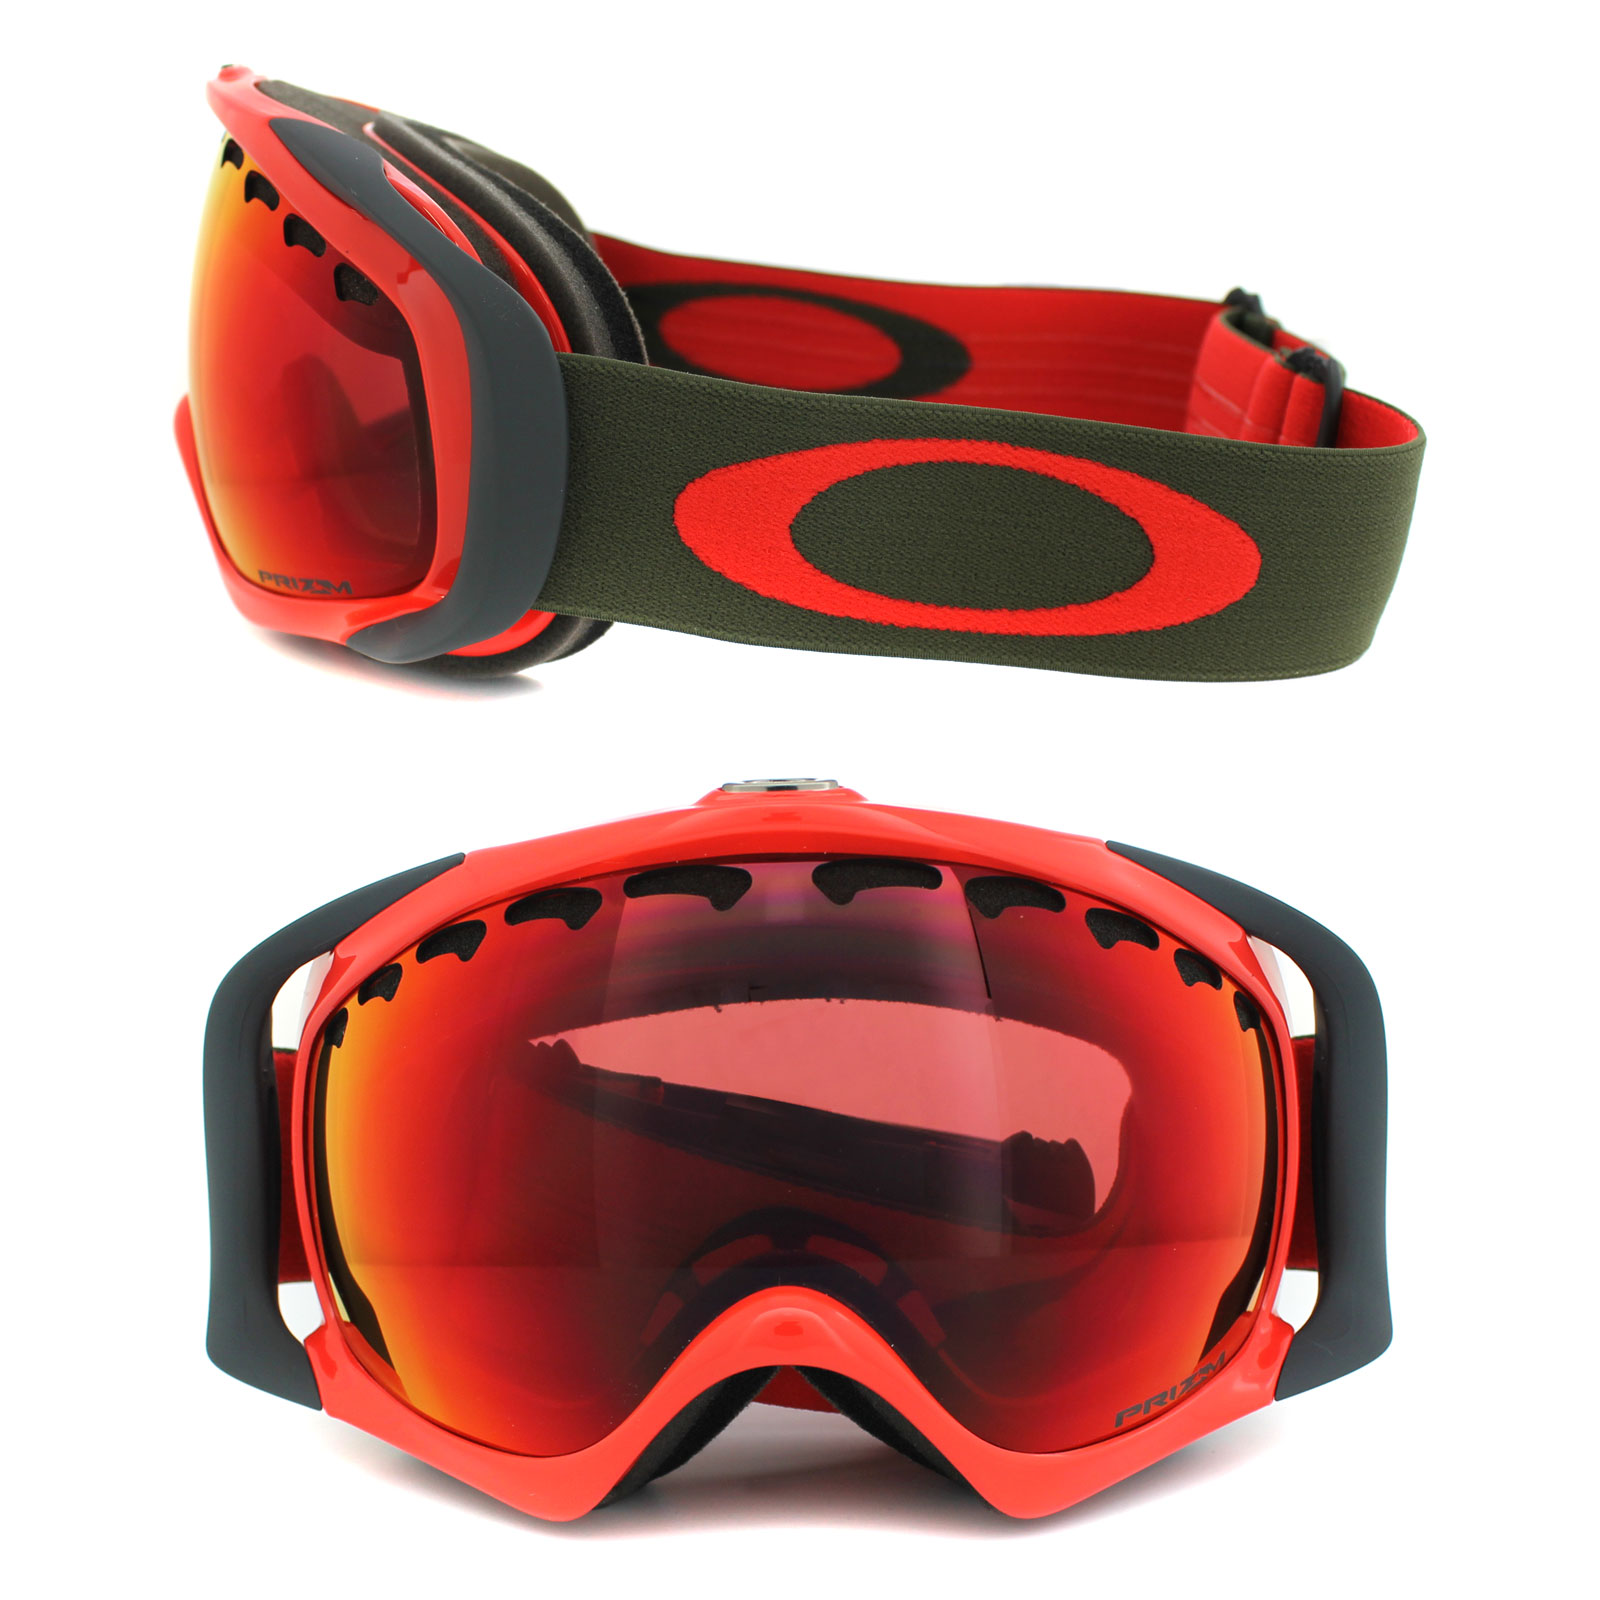 Oakley Ski Snow Goggles Crowbar Oo7005 37 Red Herb Prizm